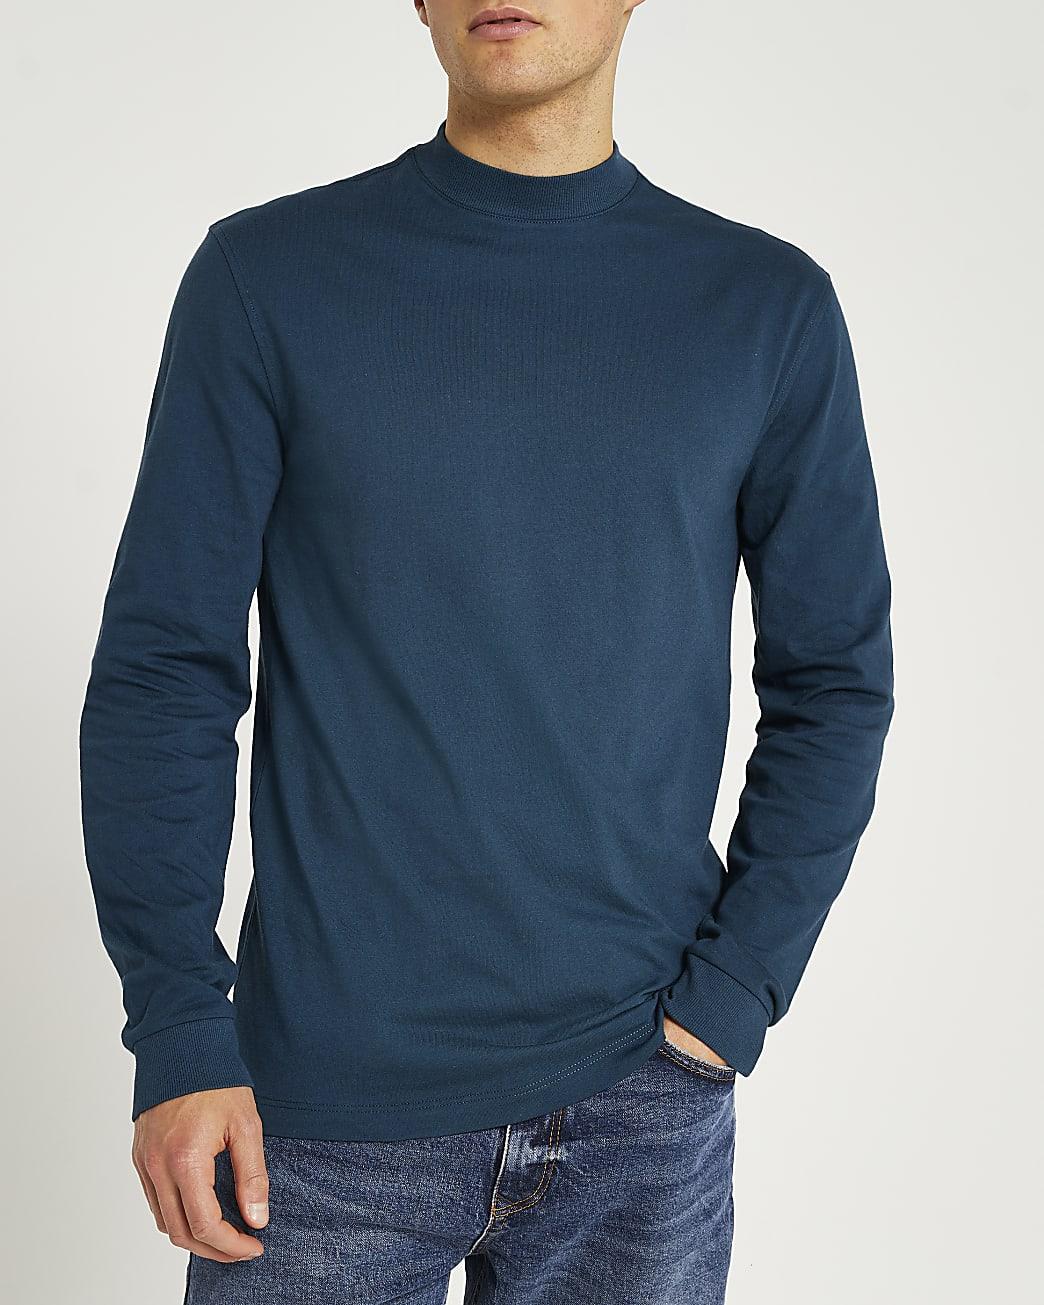 Green slim turtle neck long sleeve t-shirt